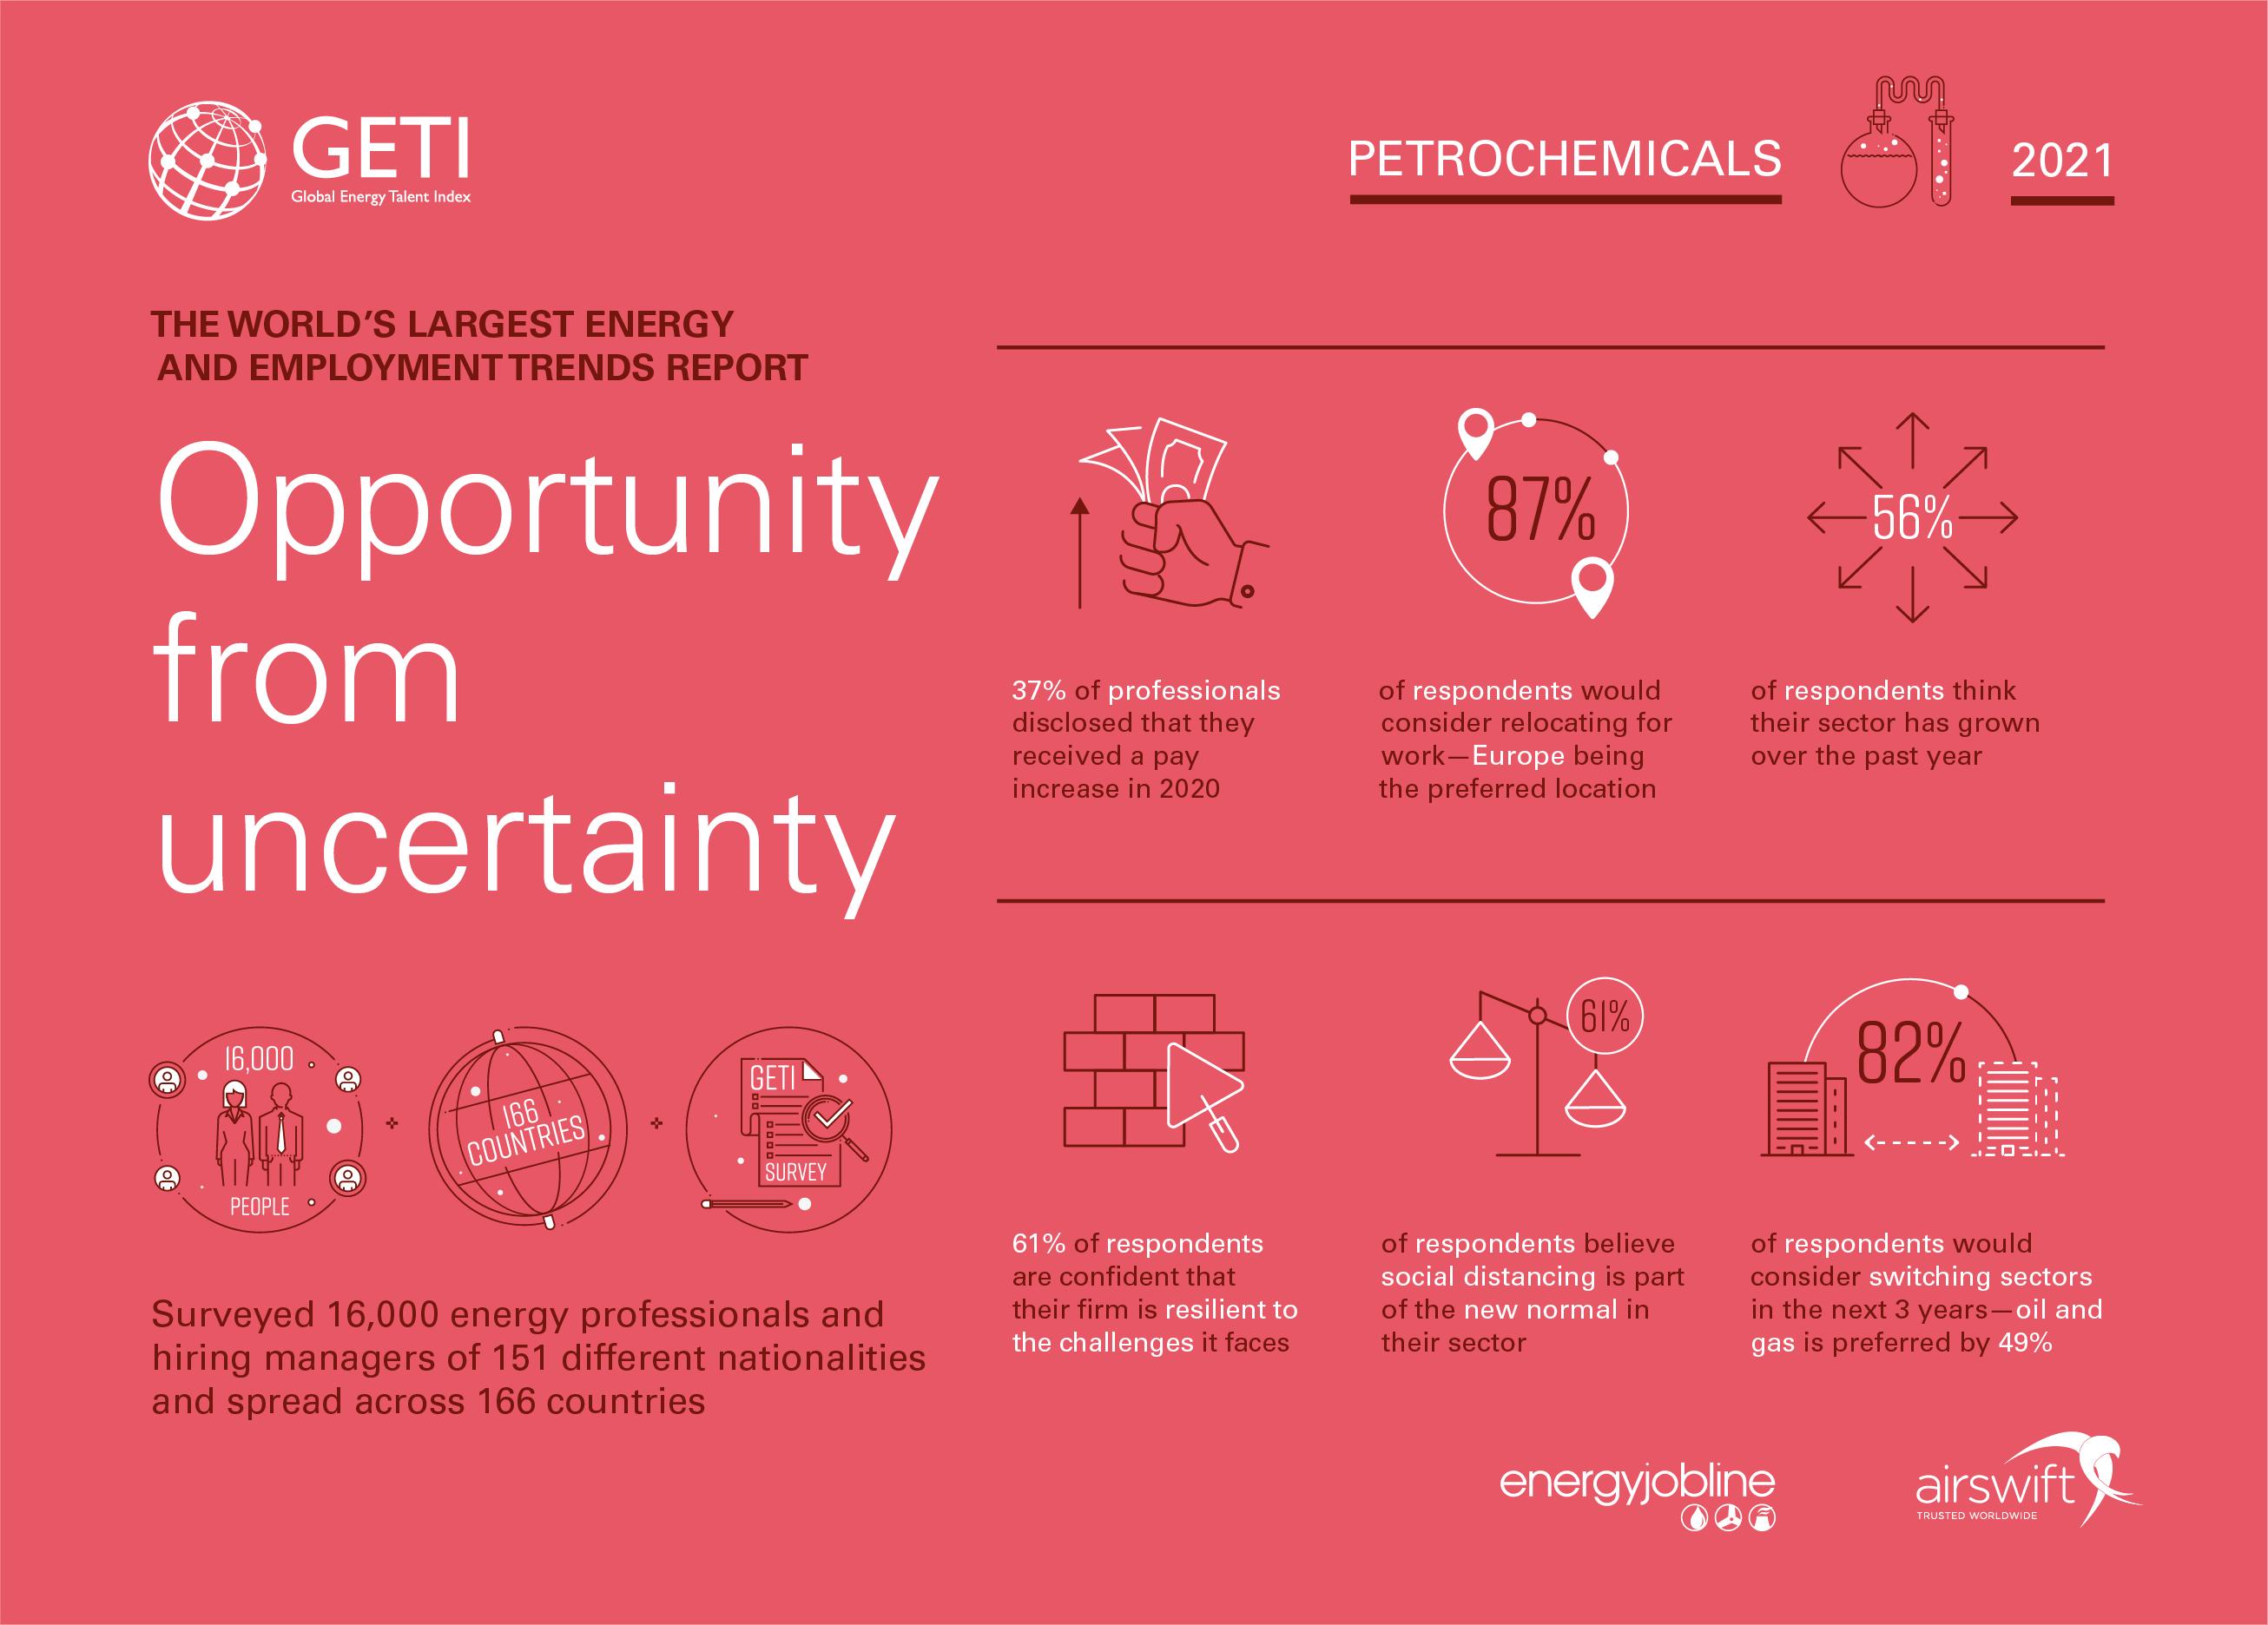 2021 GETI Infographics - PETROCHEMICALS